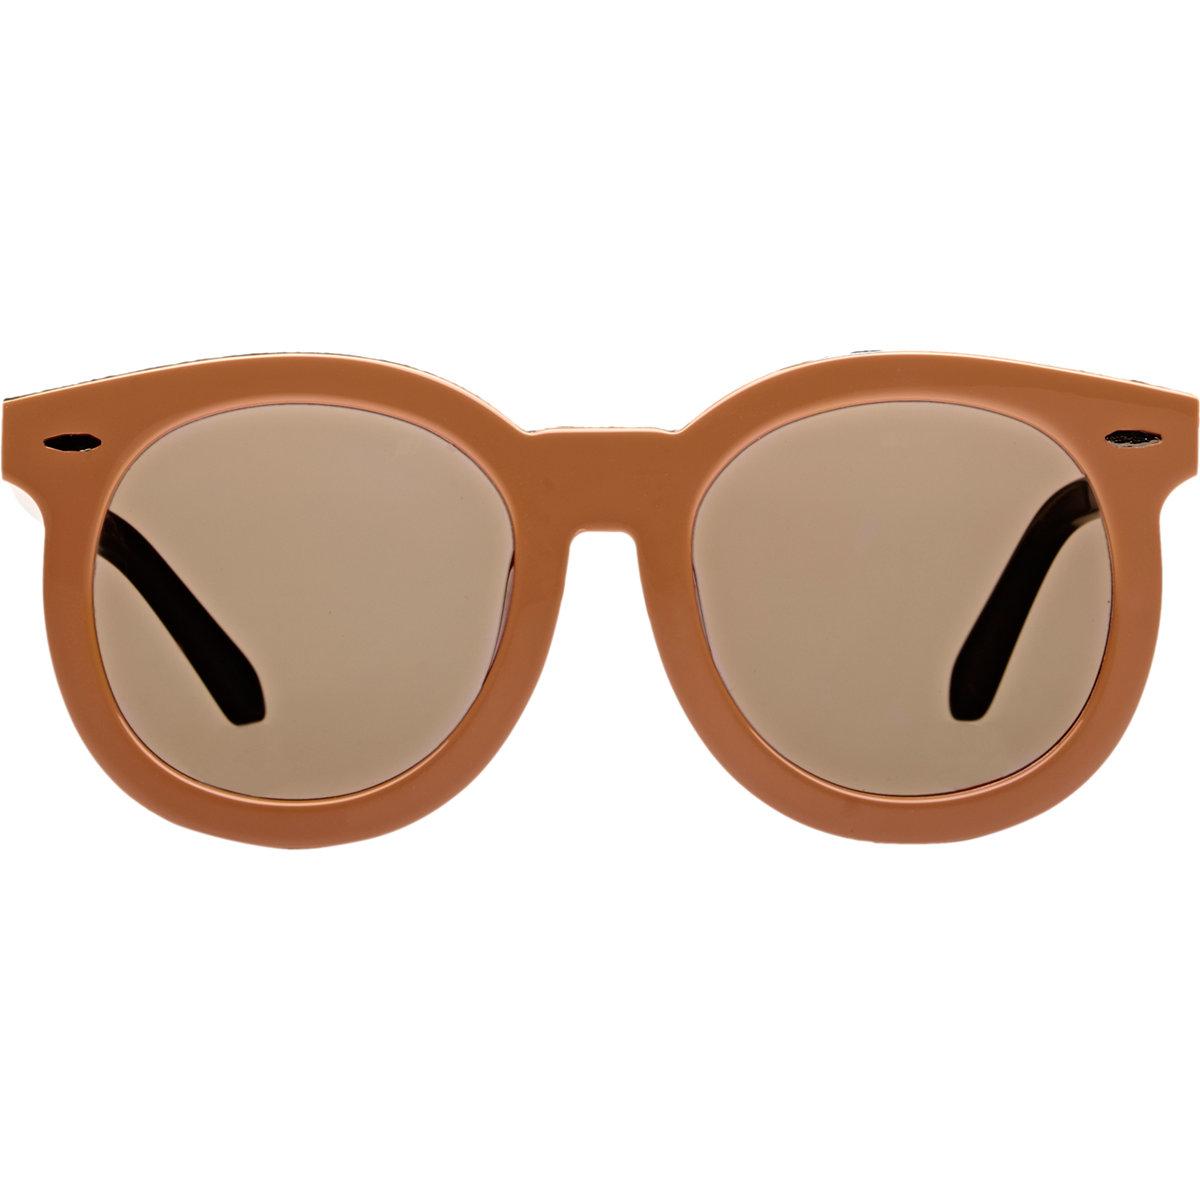 2c7879da3c9 Karen Walker Super Duper Thistle Sunglasses in Brown - Lyst